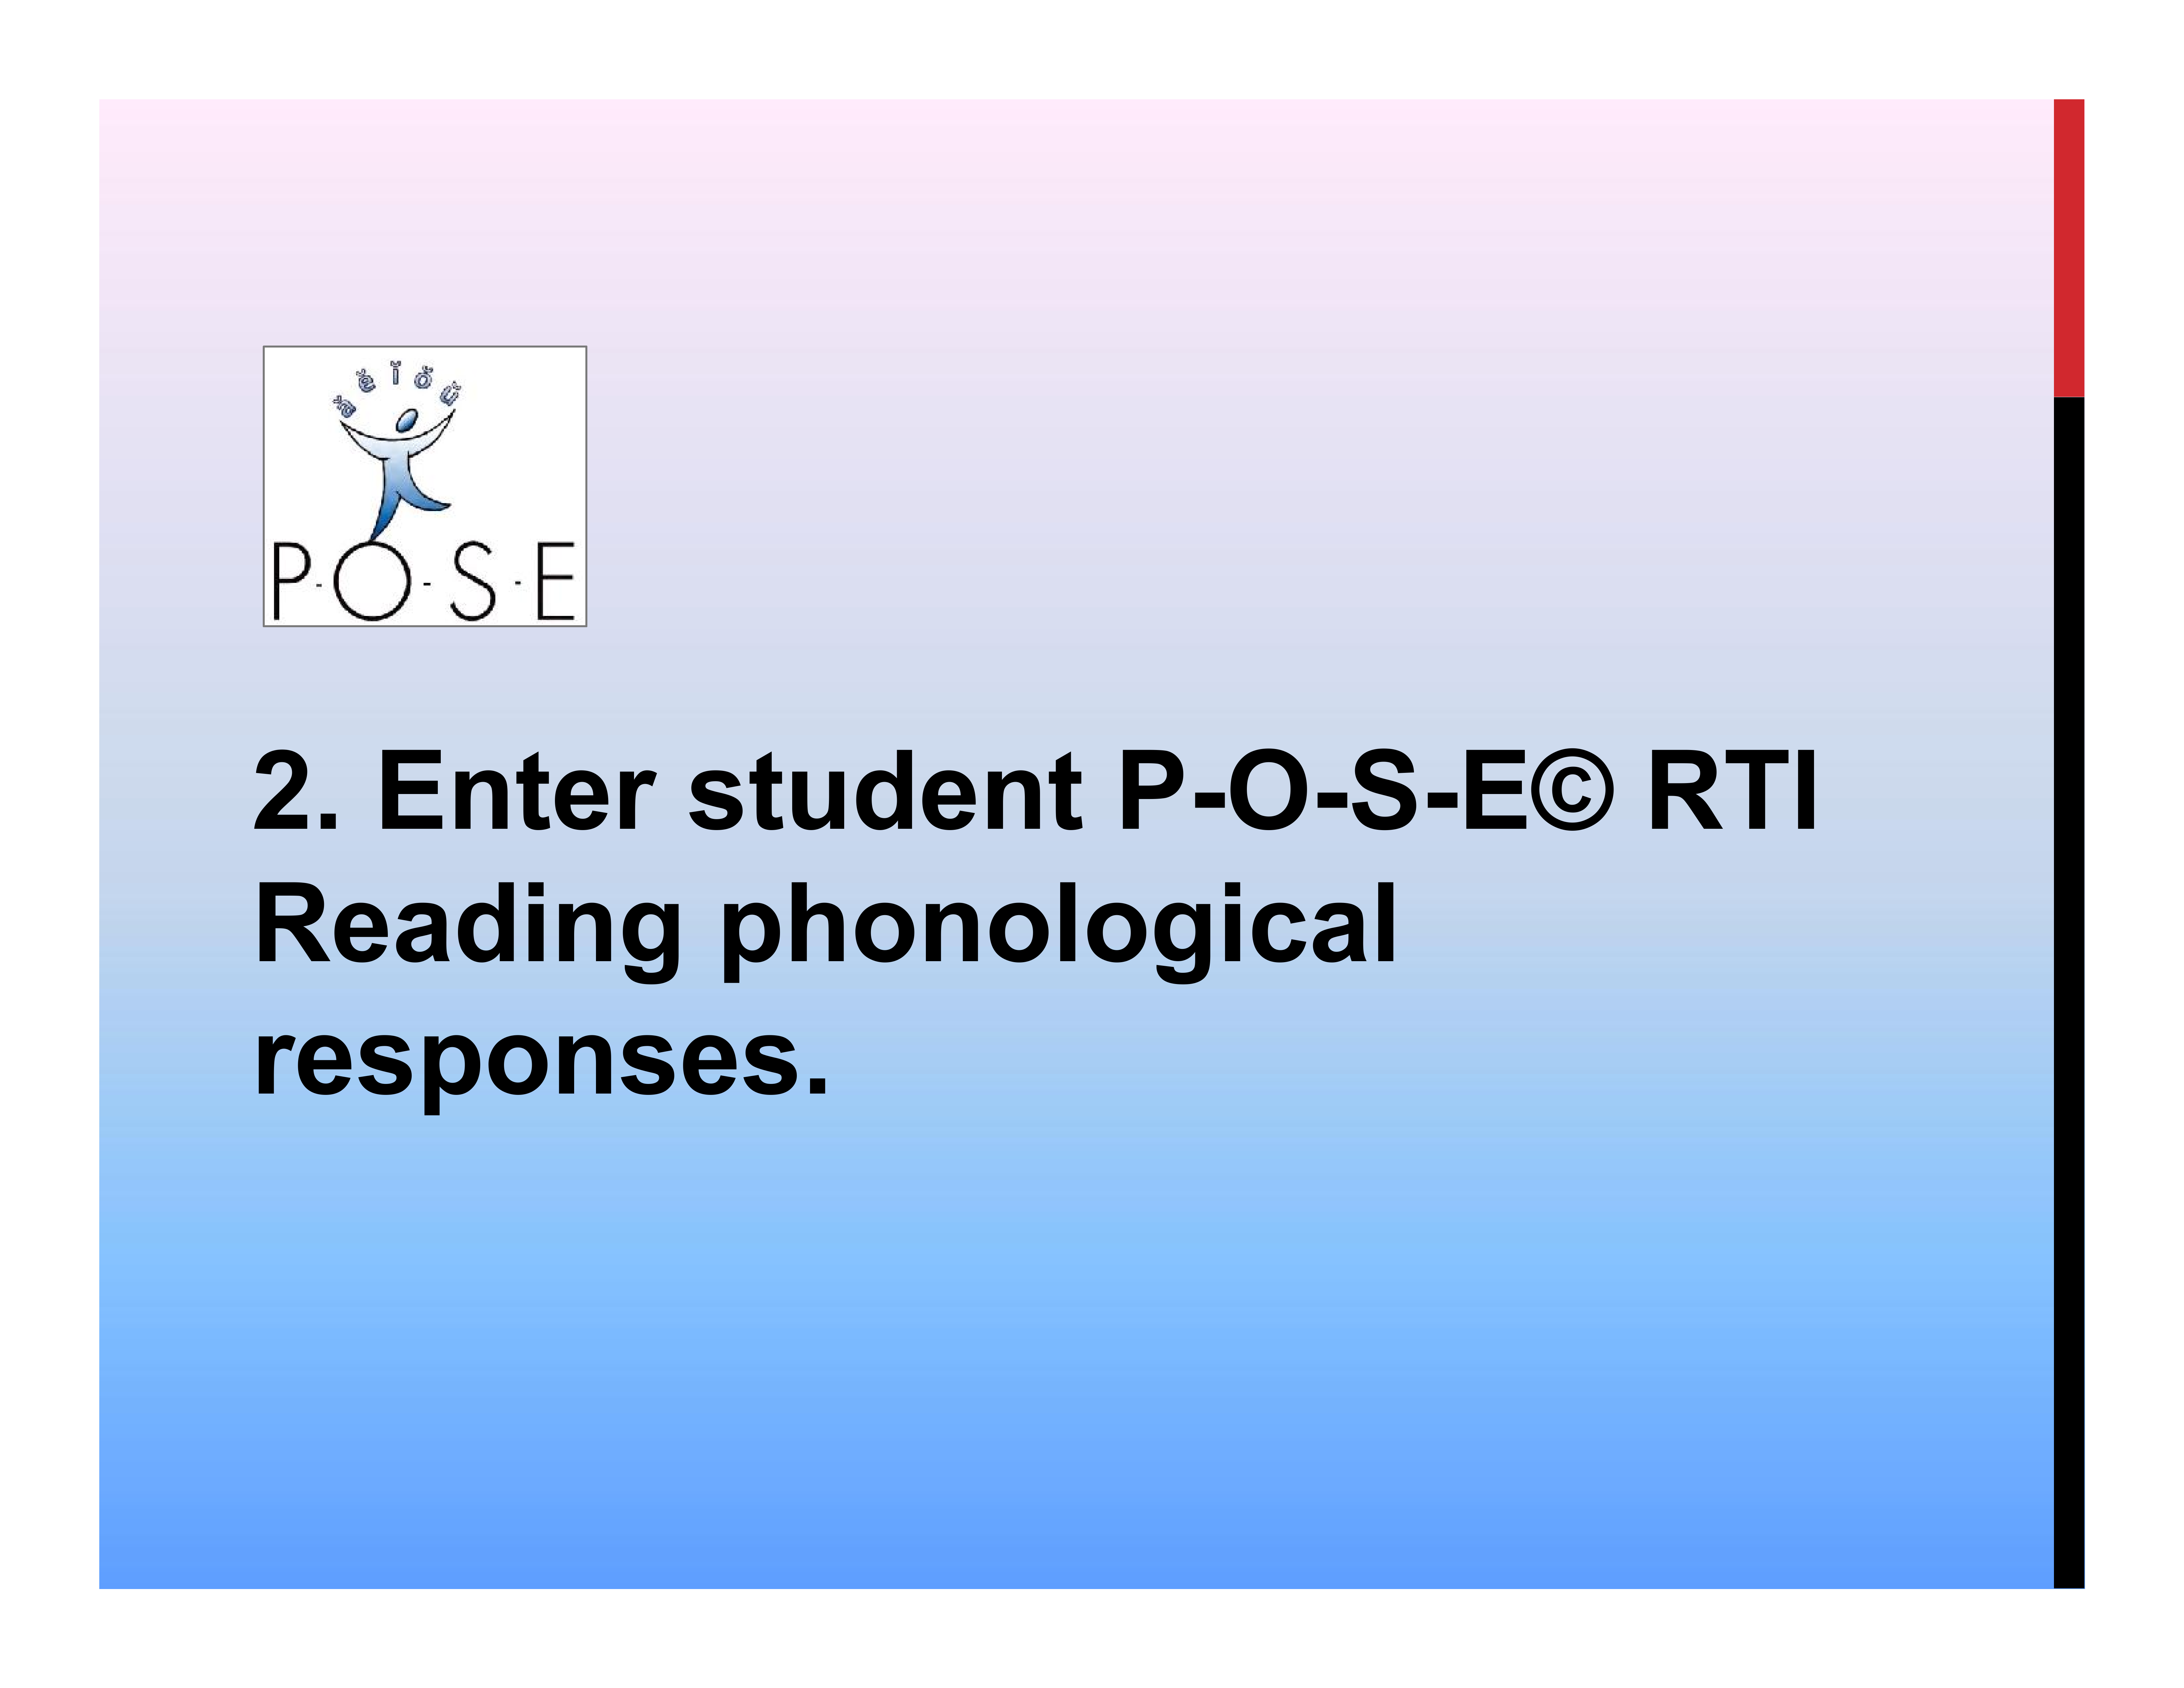 P-O-S-E literacy ELL phonology 9